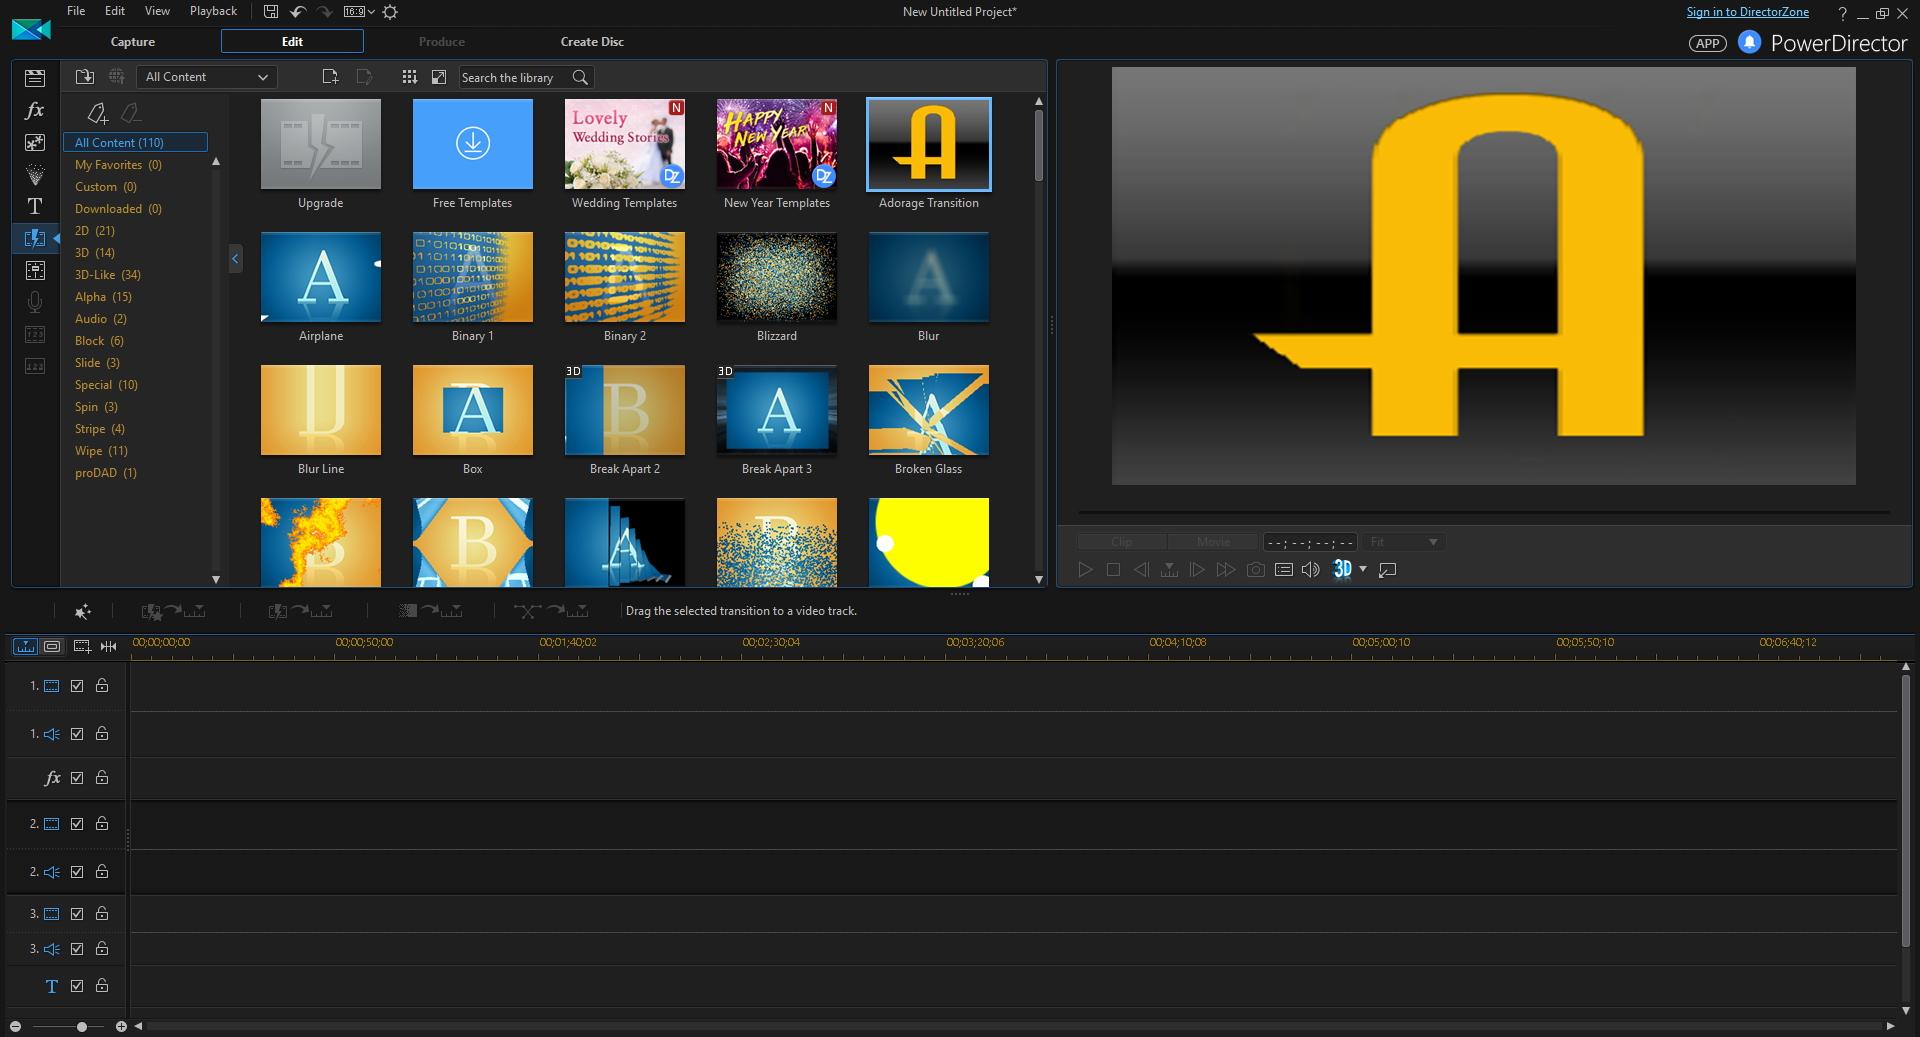 Video Editing Software, PowerDirector Screenshot